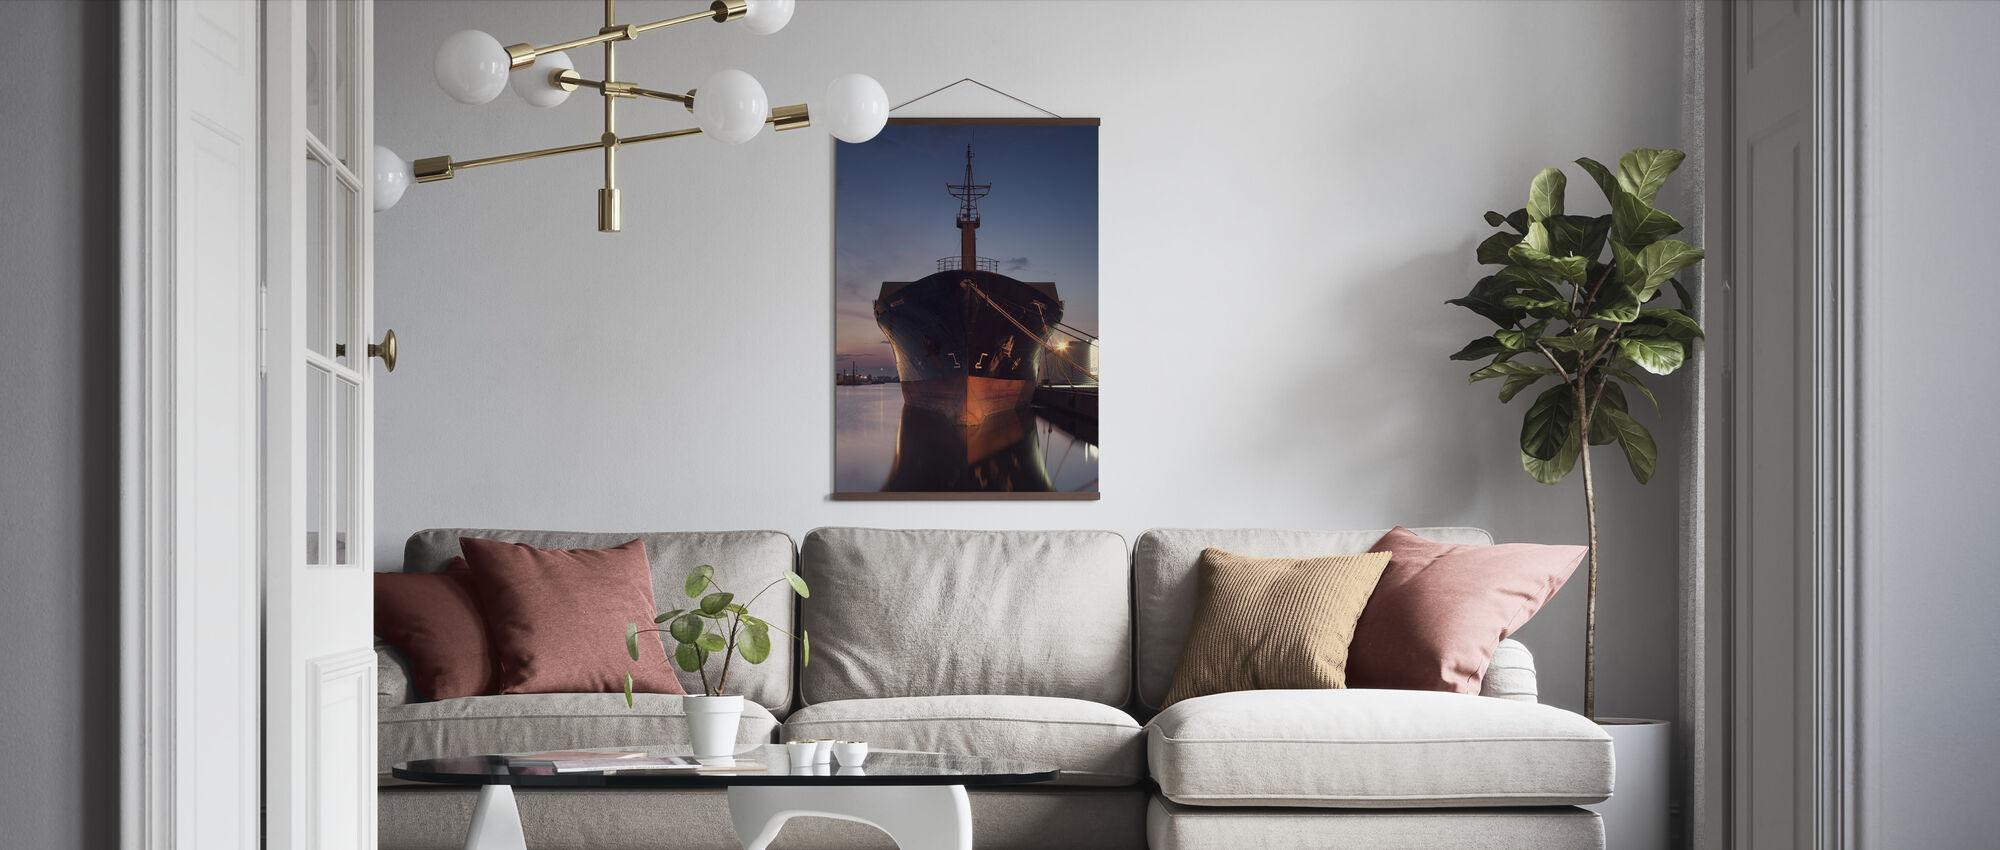 Ship in Eastern Harbor, Malmö Sweden - Poster - Living Room